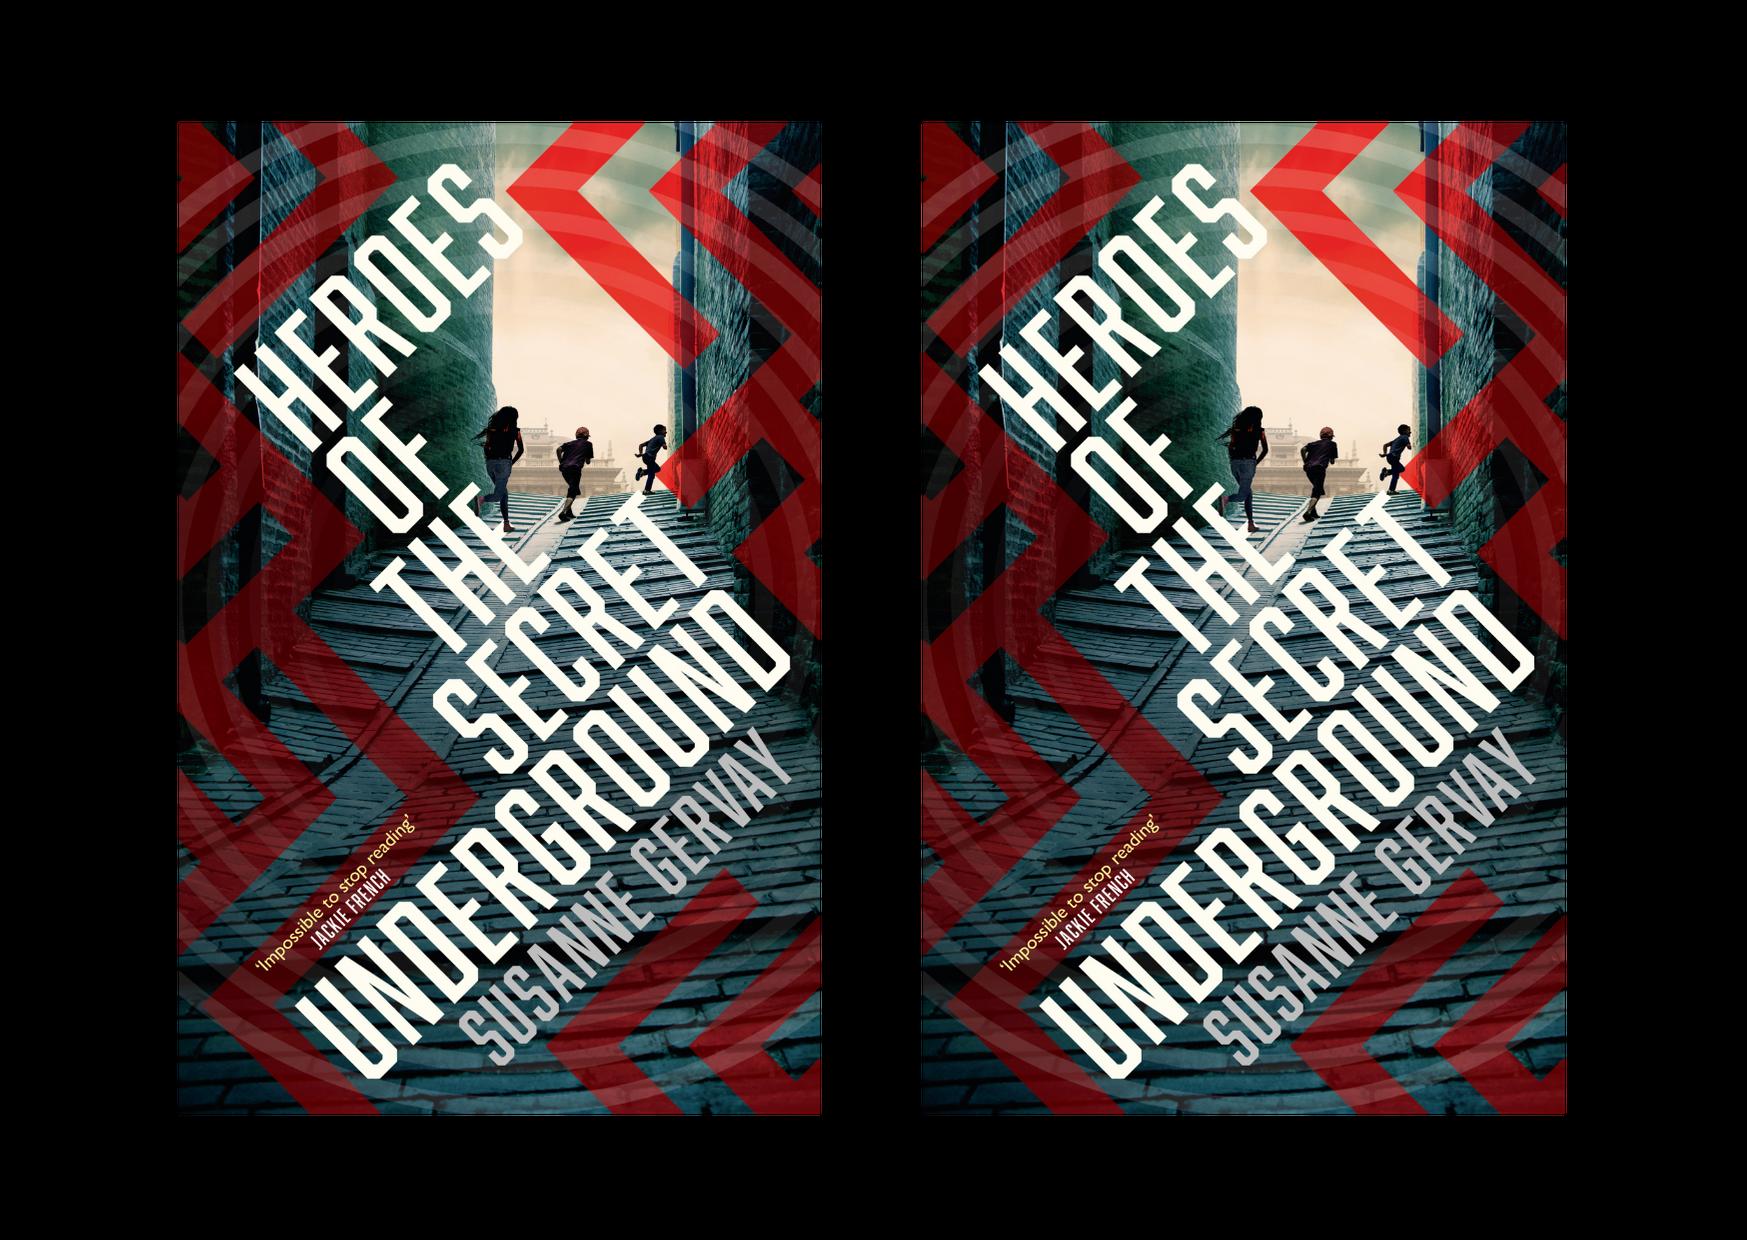 HarperCollins - Heroes of the Secret Und